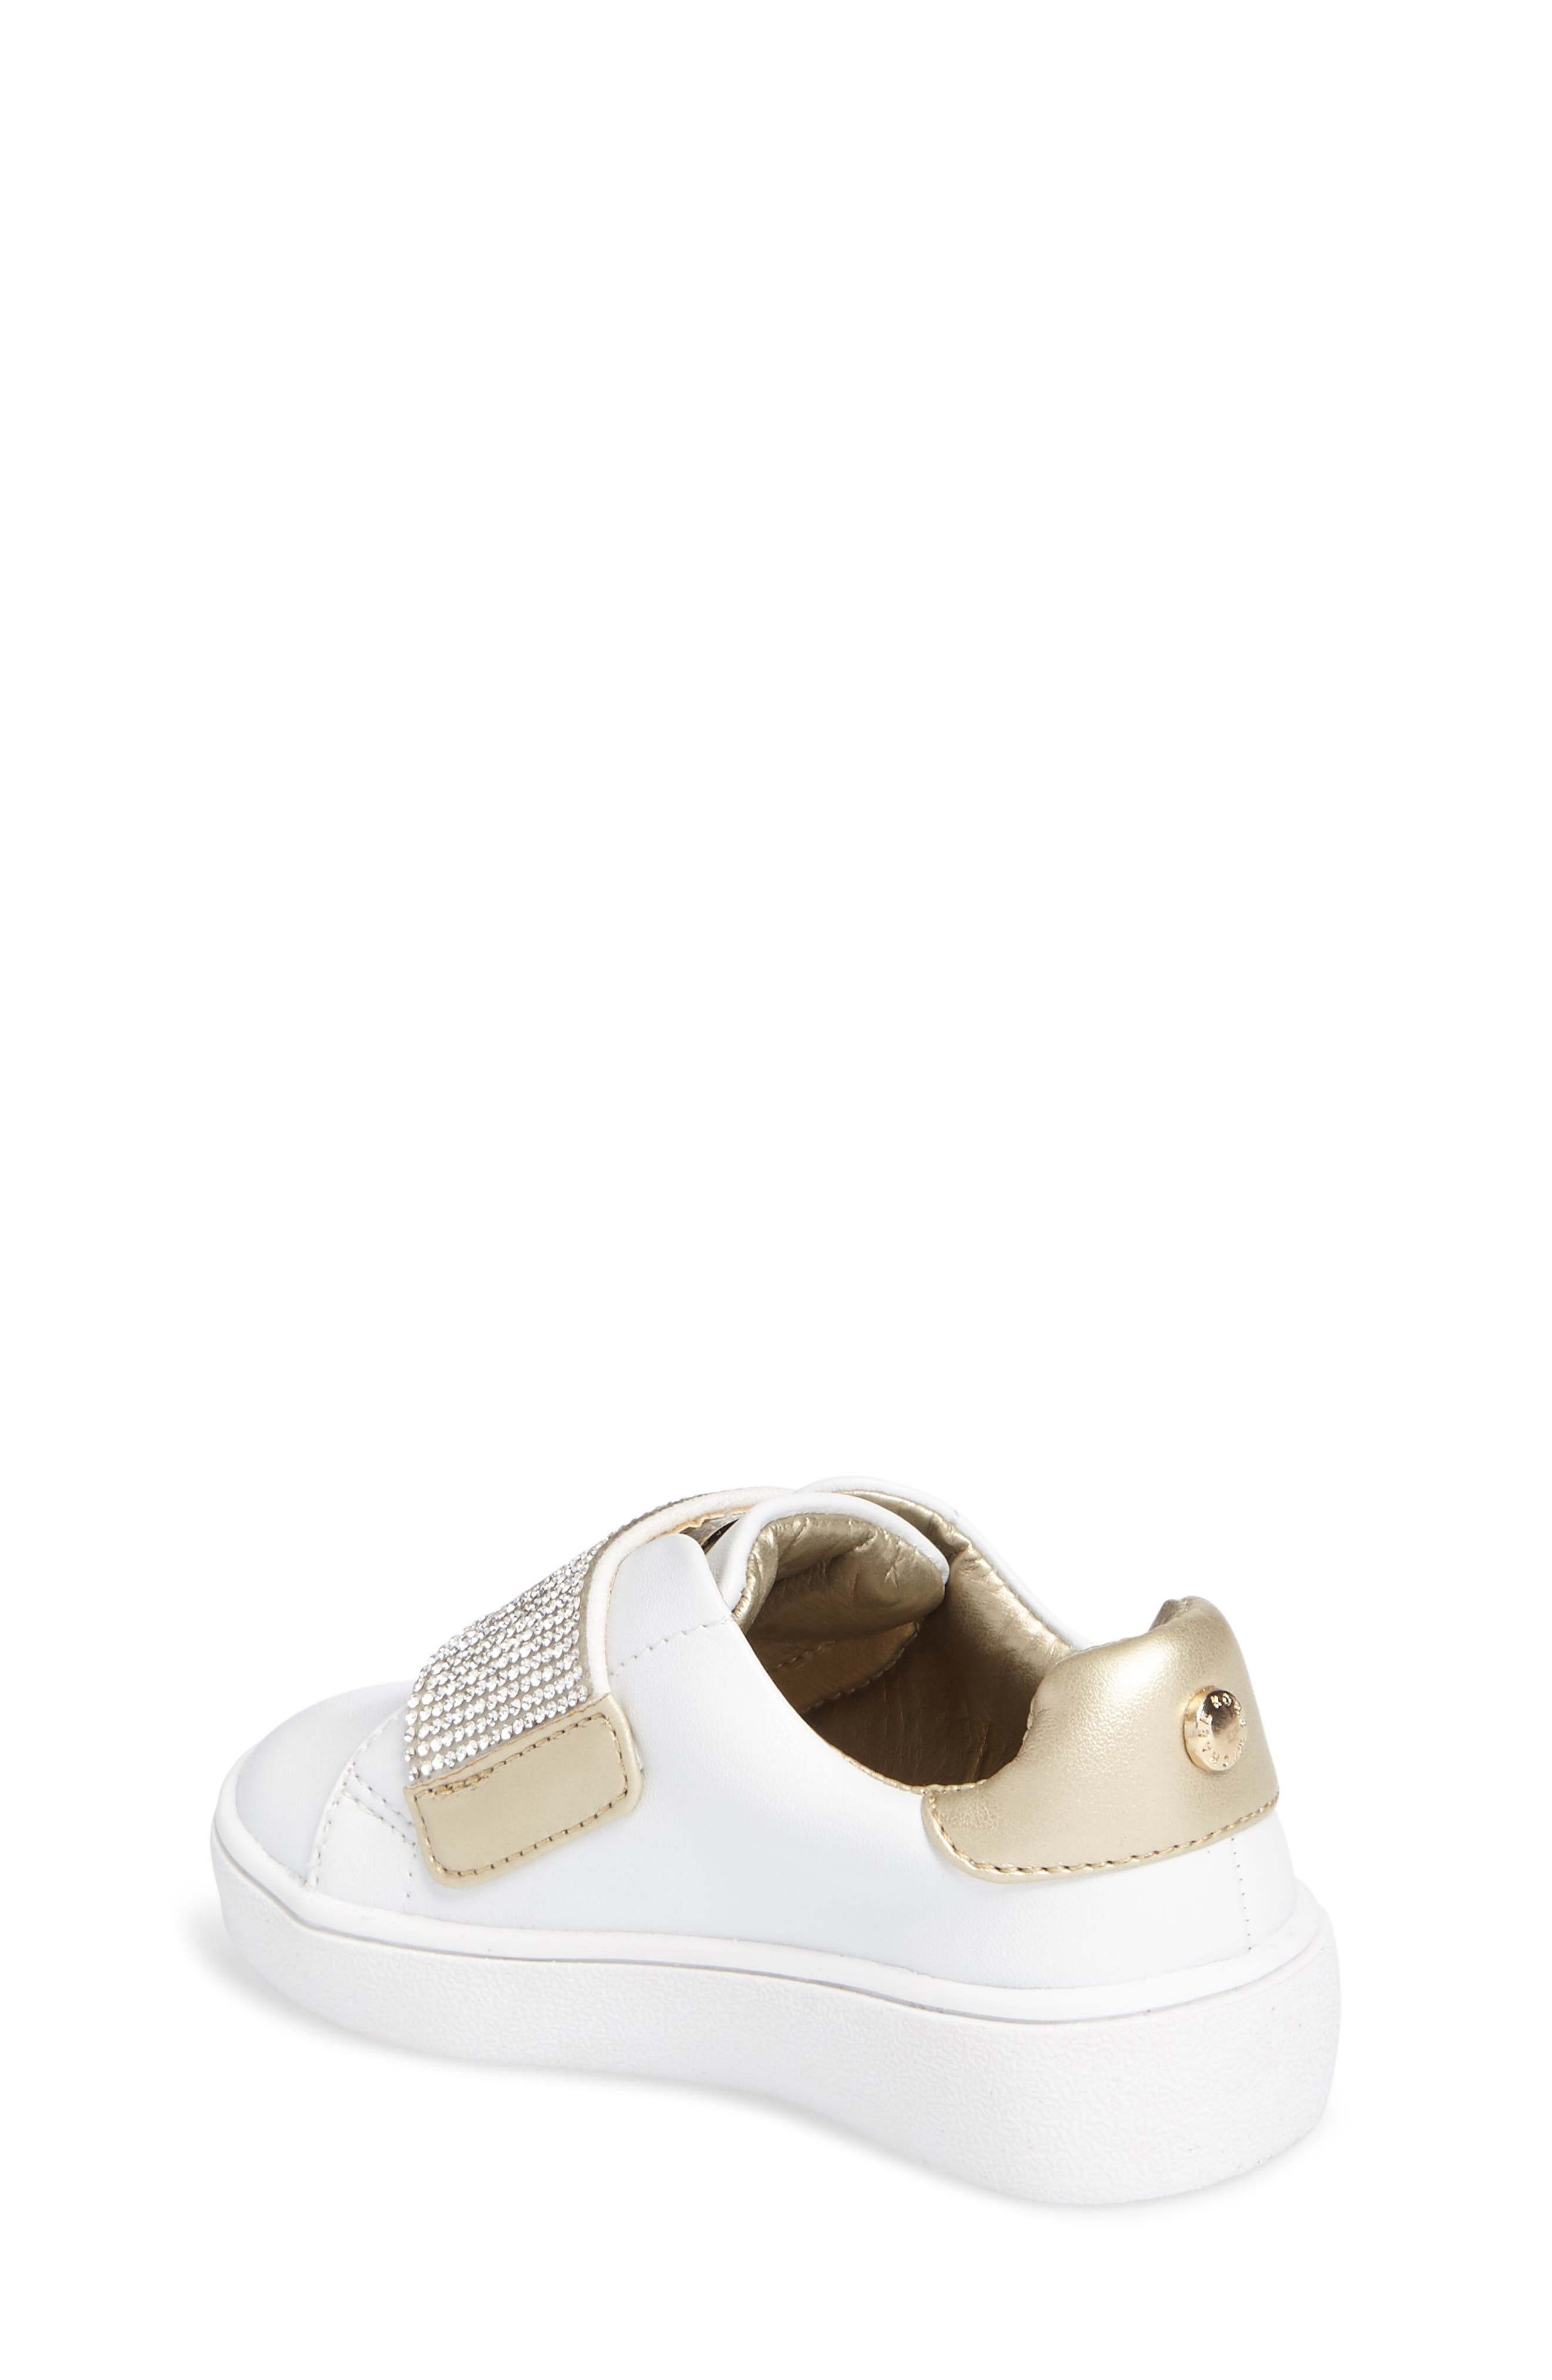 Alternate Image 2  - MICHAEL Michael Kors Ivy Candy Sneaker (Walker, Toddler, Little Kid & Big Kid)